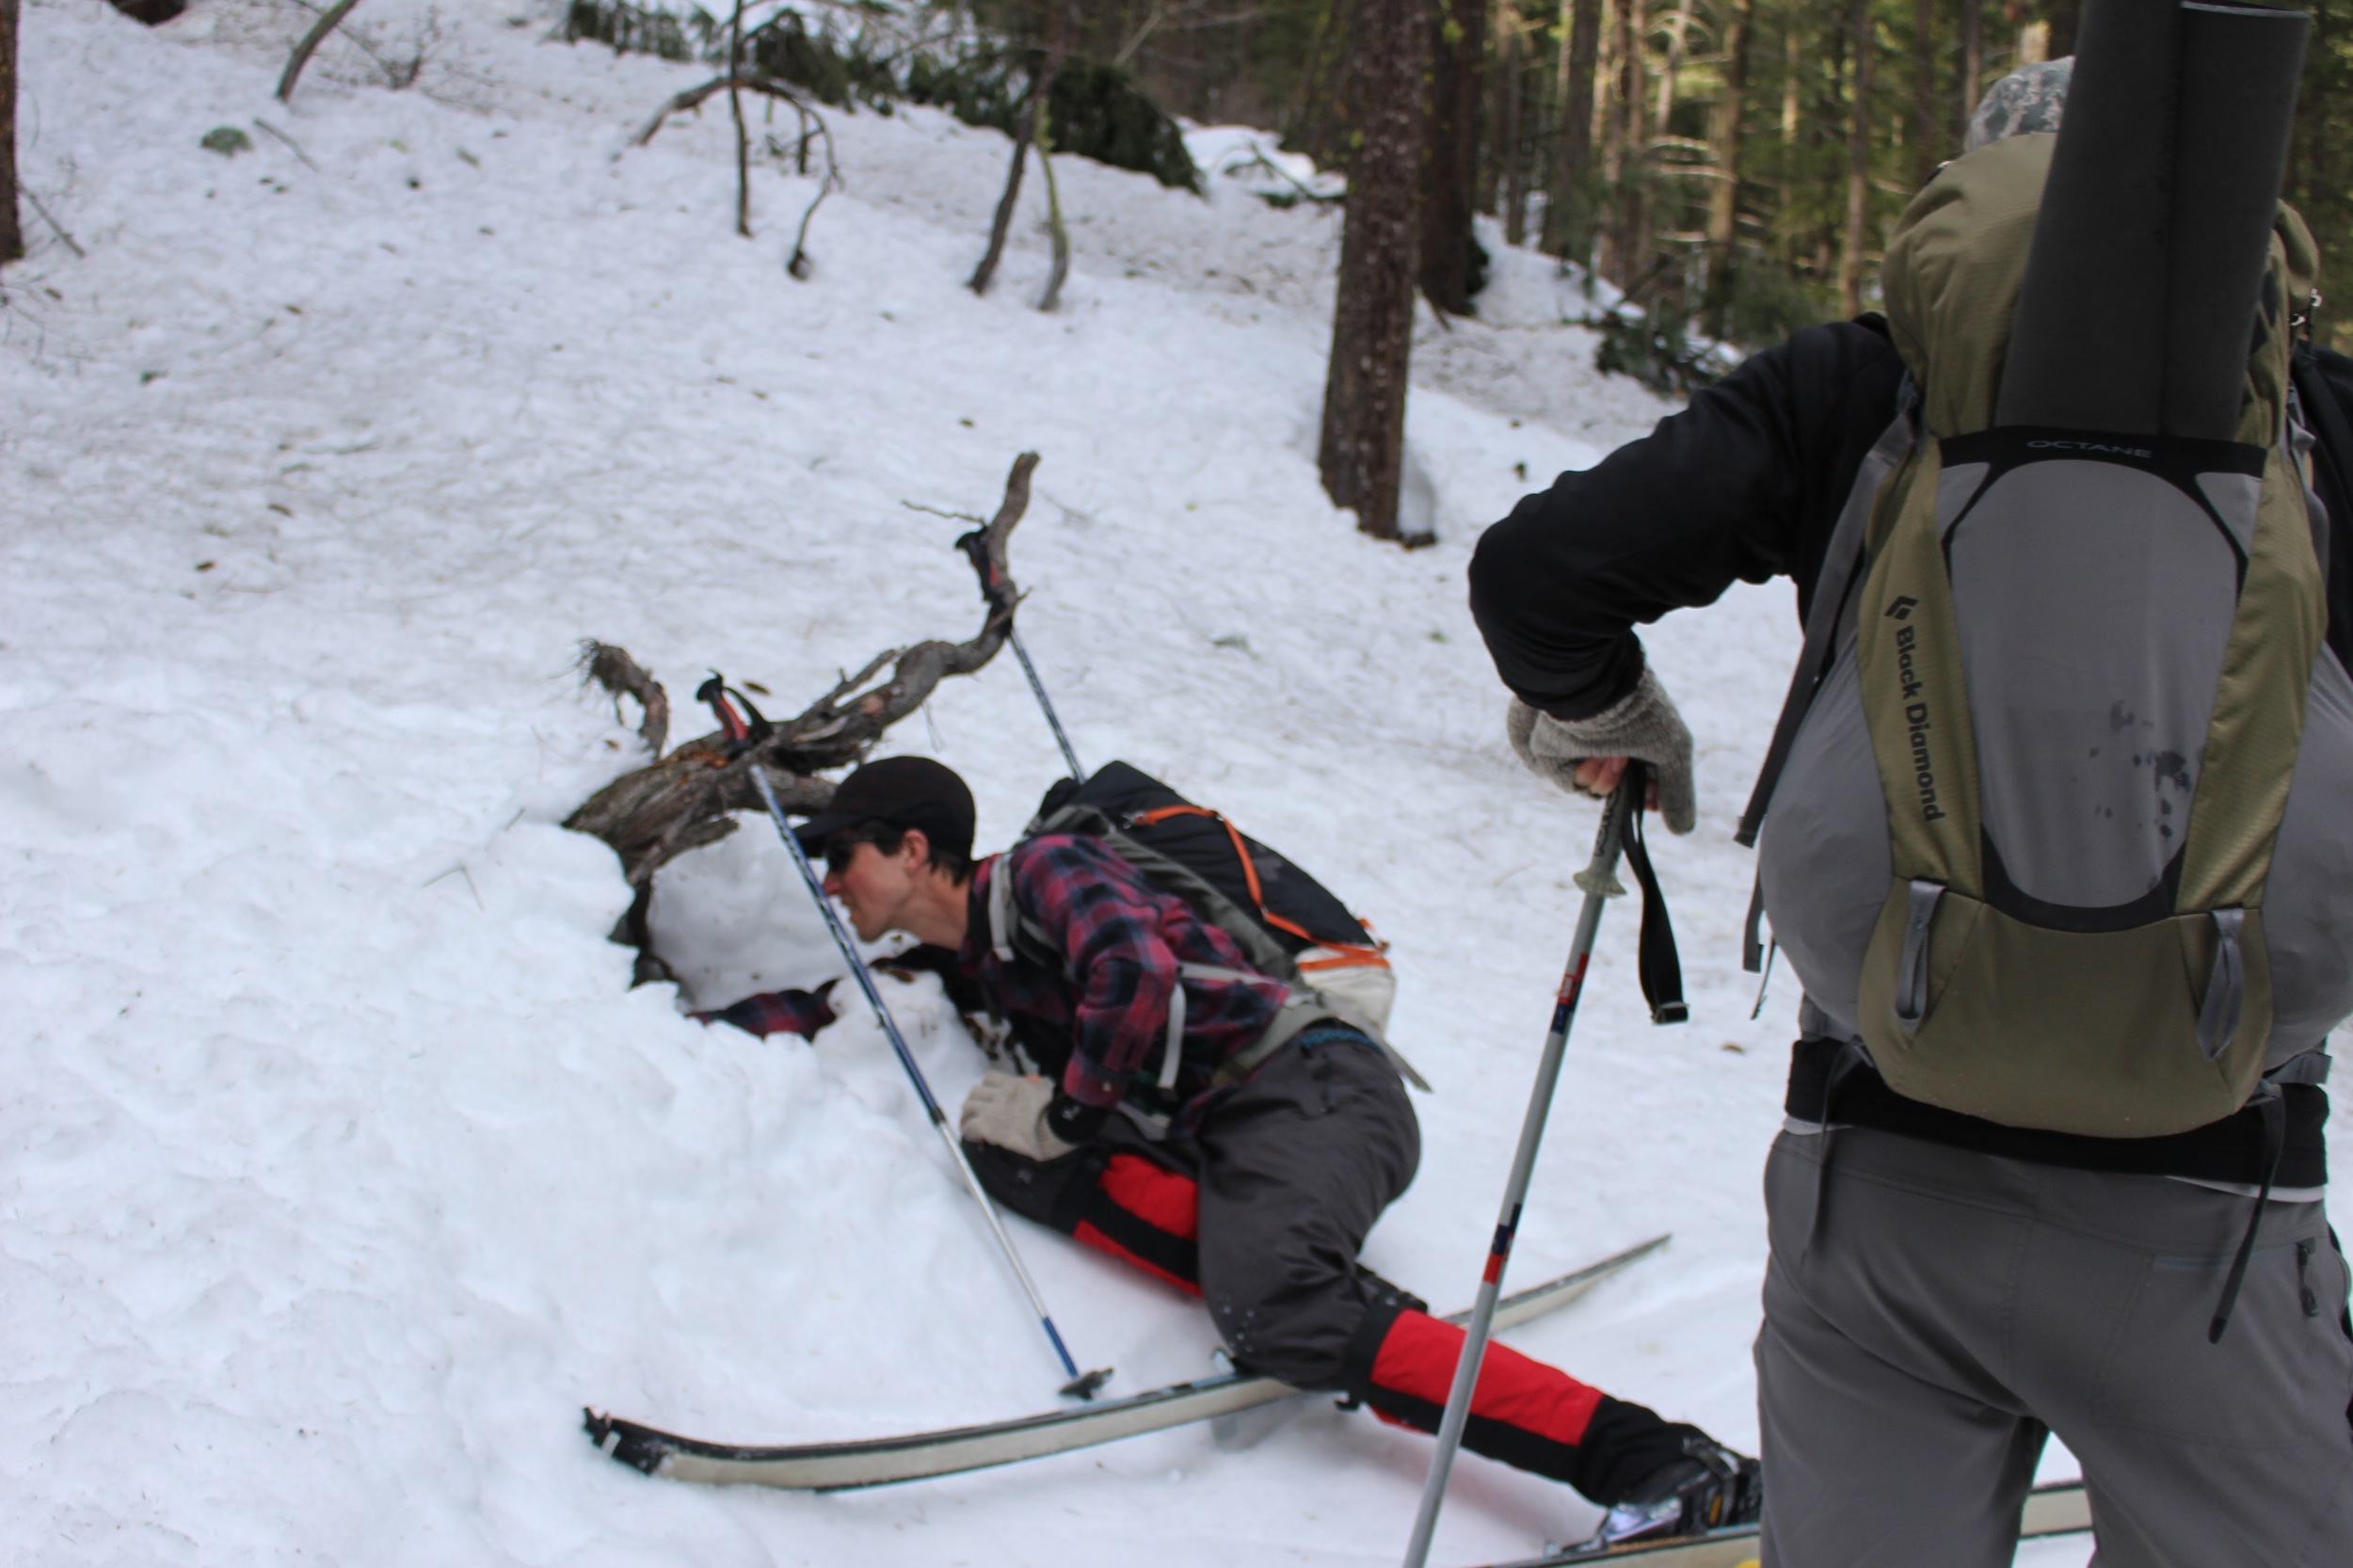 Joe Loviska getting deep in the tracking lesson. Photo courtesy of Aly Gourd.